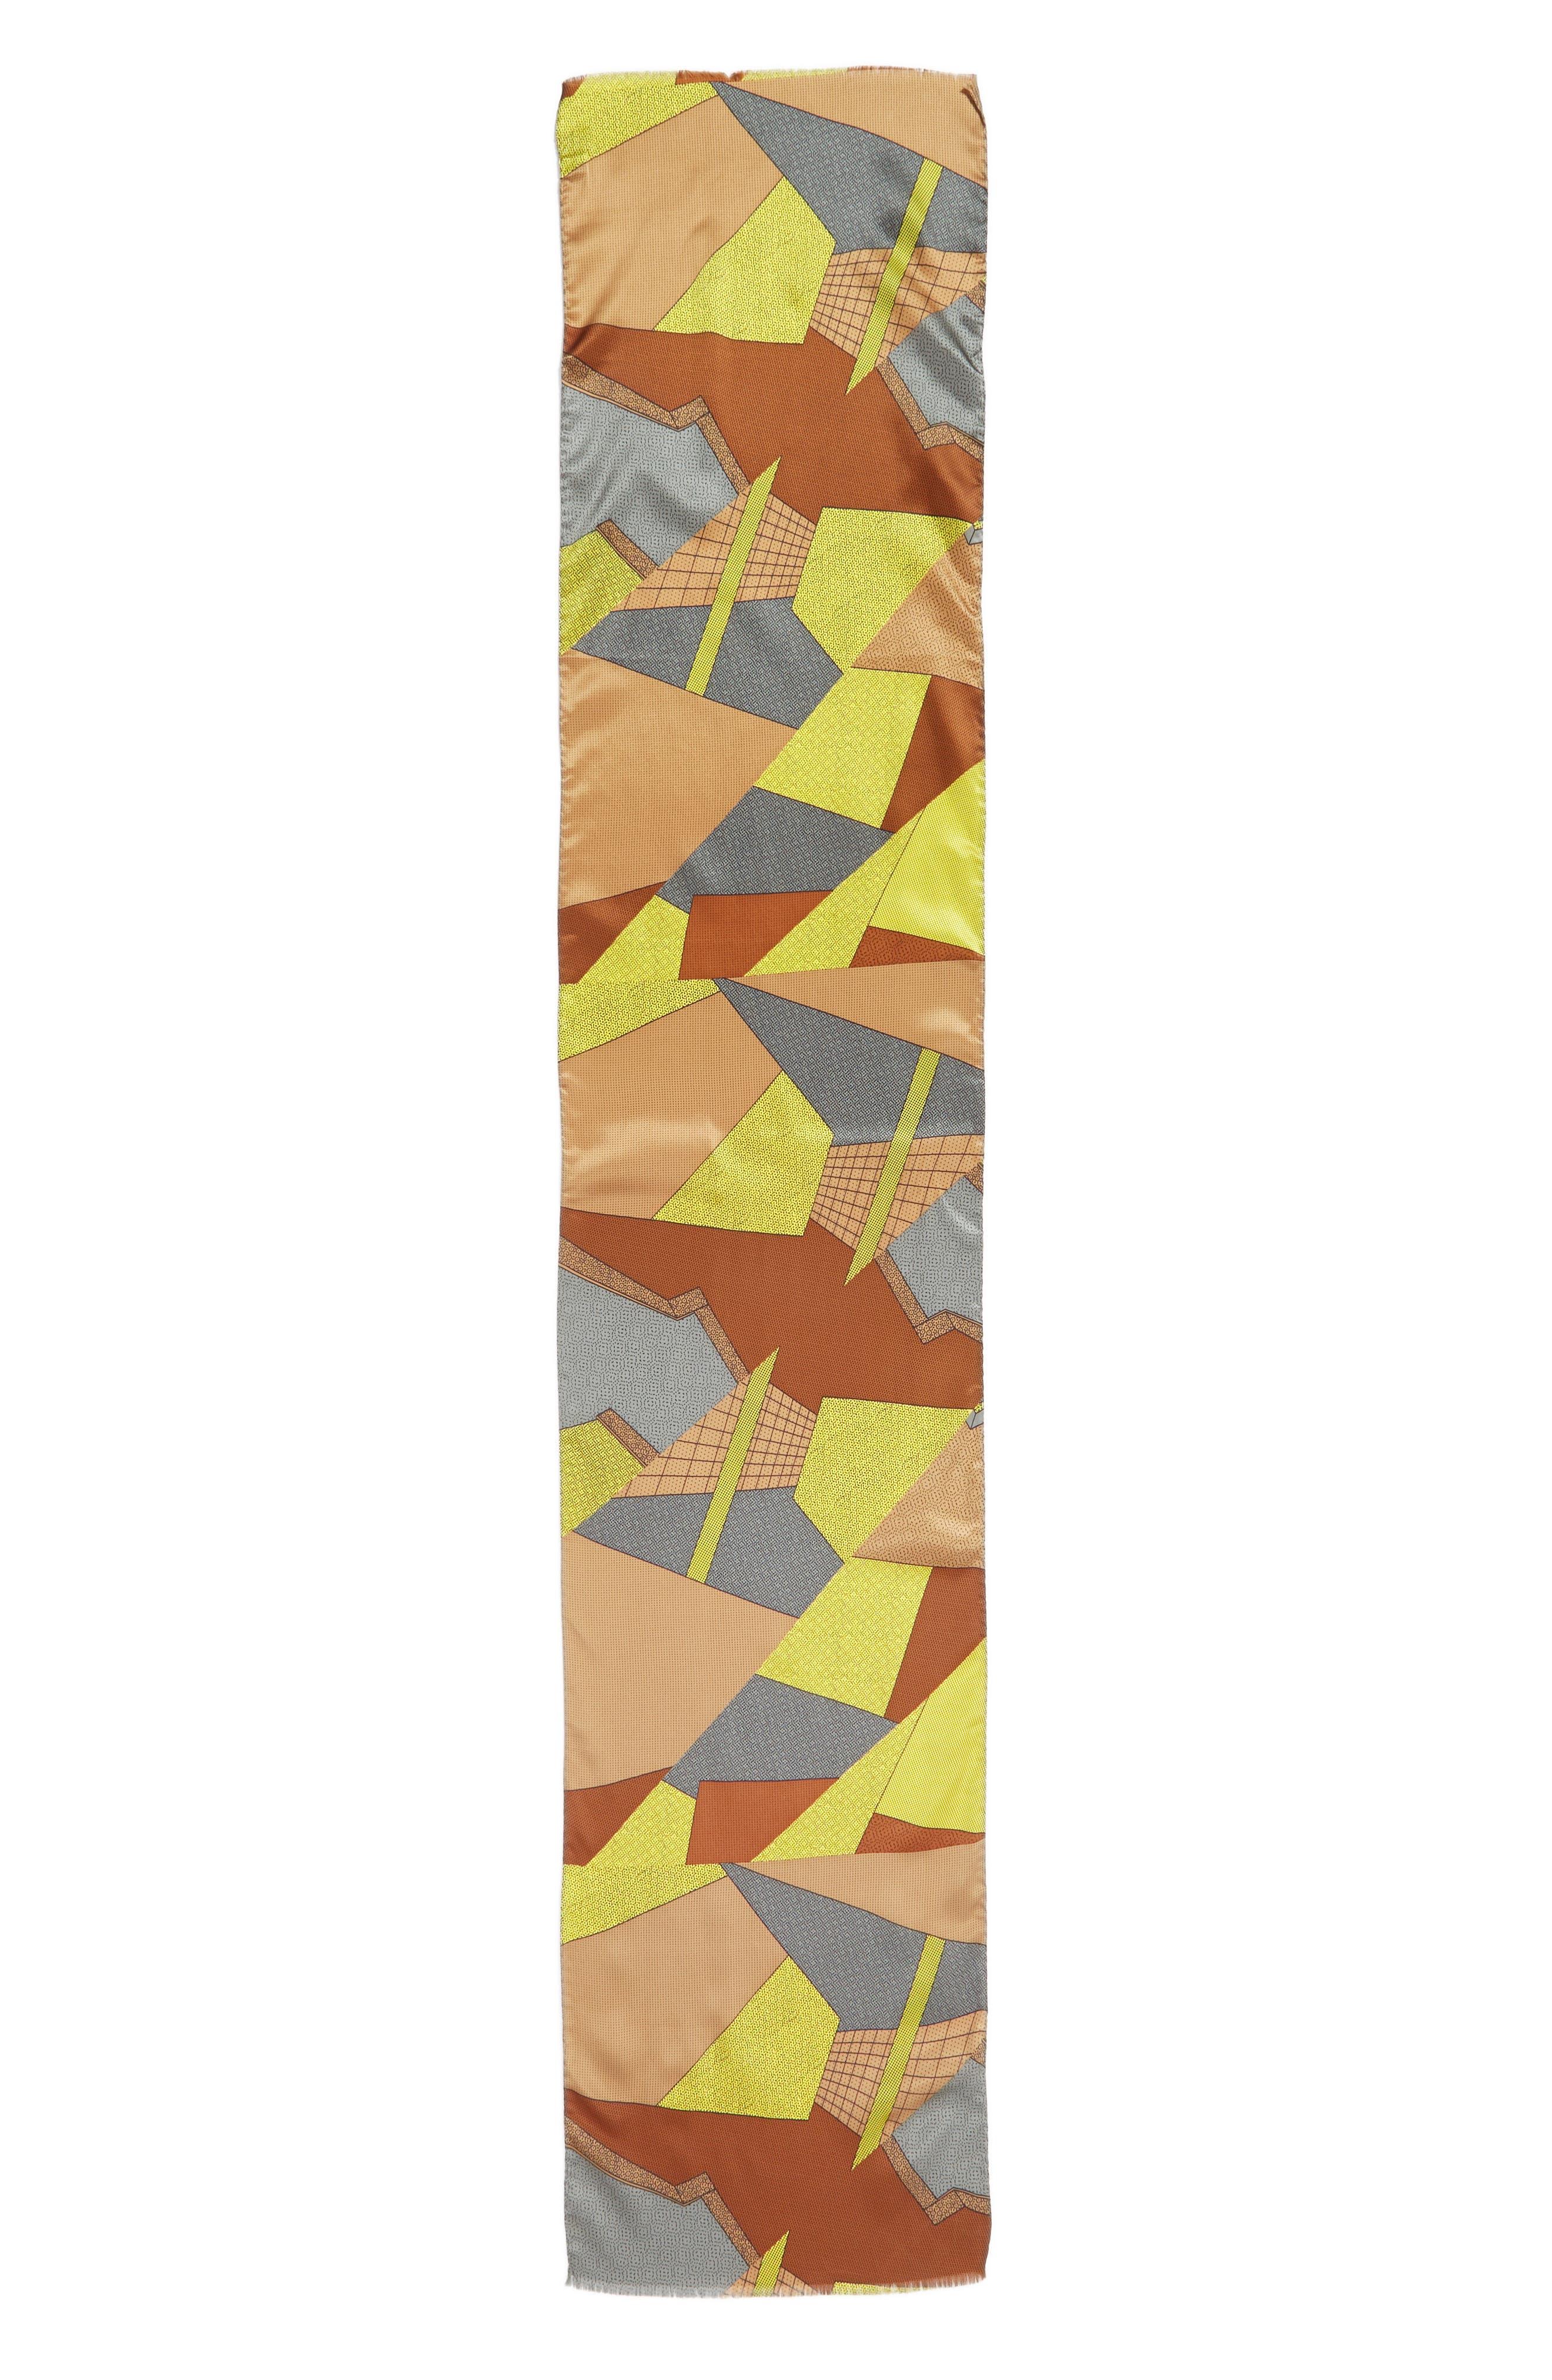 MEMPHIS GROUP, MEMPHIS Milano Print Silk Scarf, Alternate thumbnail 2, color, 700